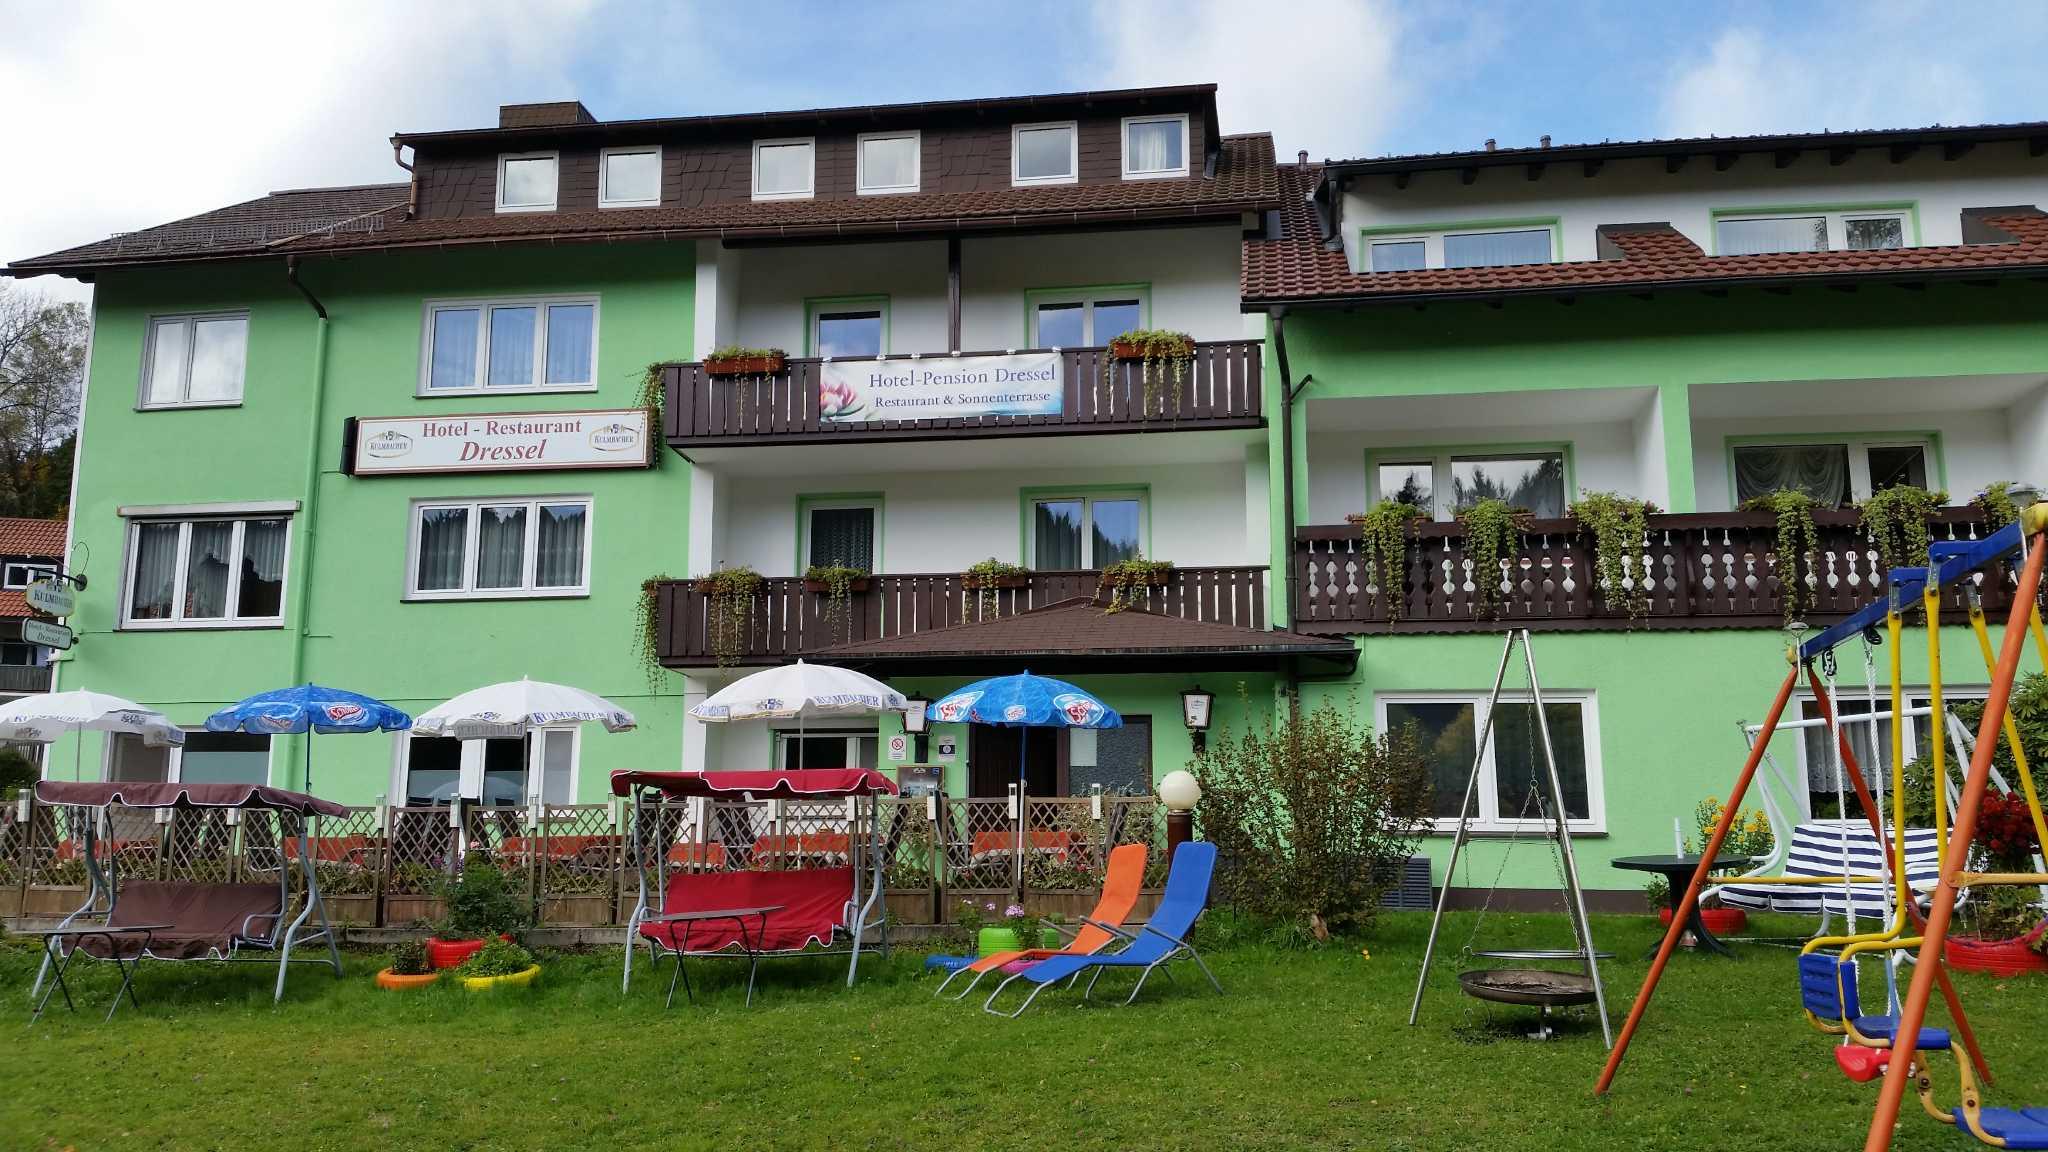 Gruppenferienhaus Hotel-Pension Dressel